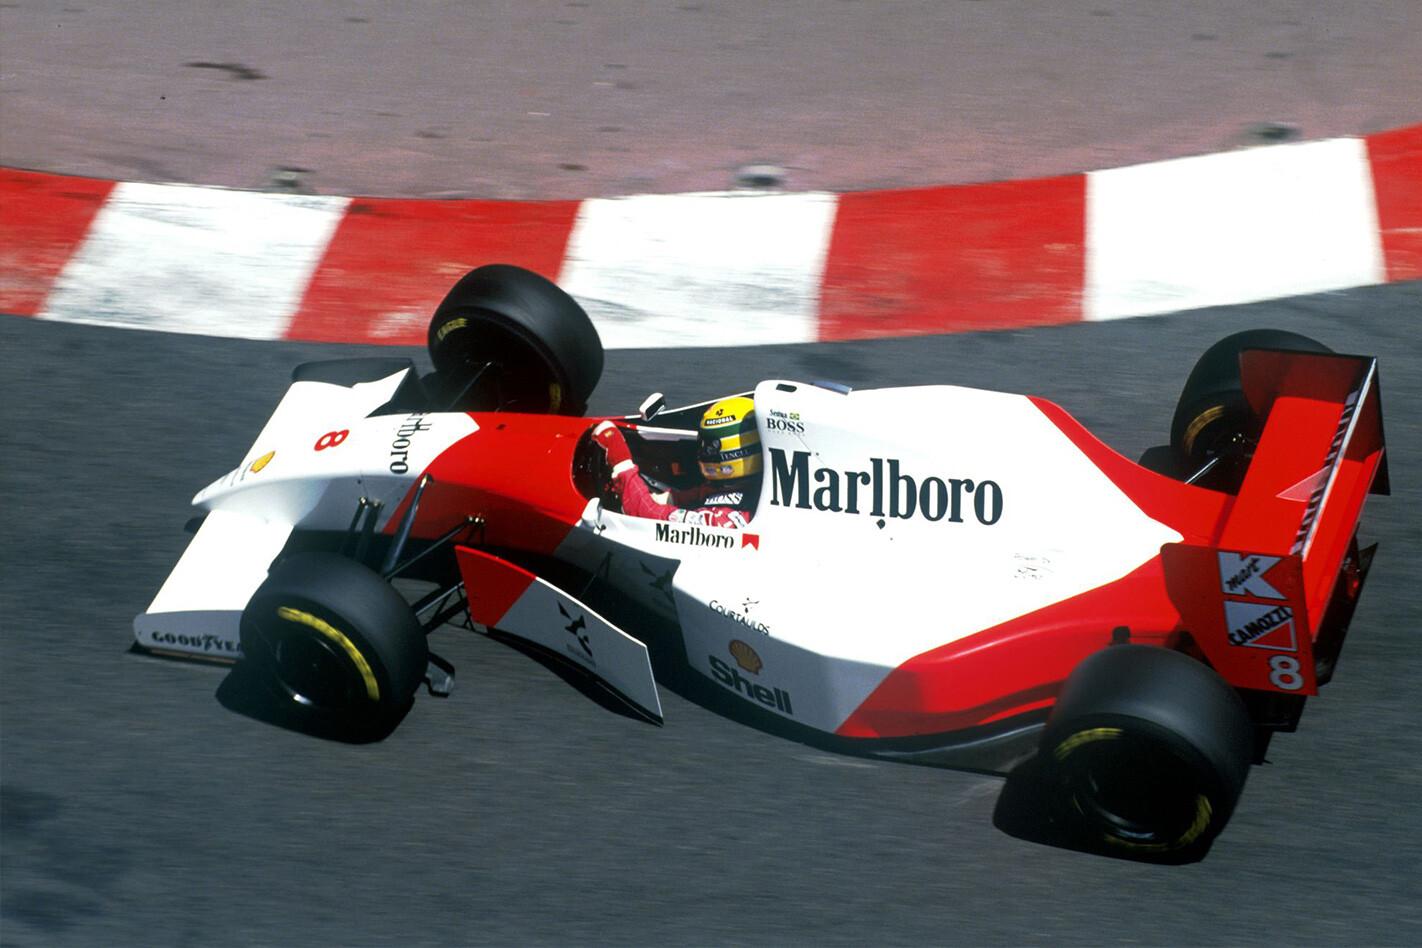 Ayrton Senna F 1 Cars For Sale Rear 1993 Monaco Jpg